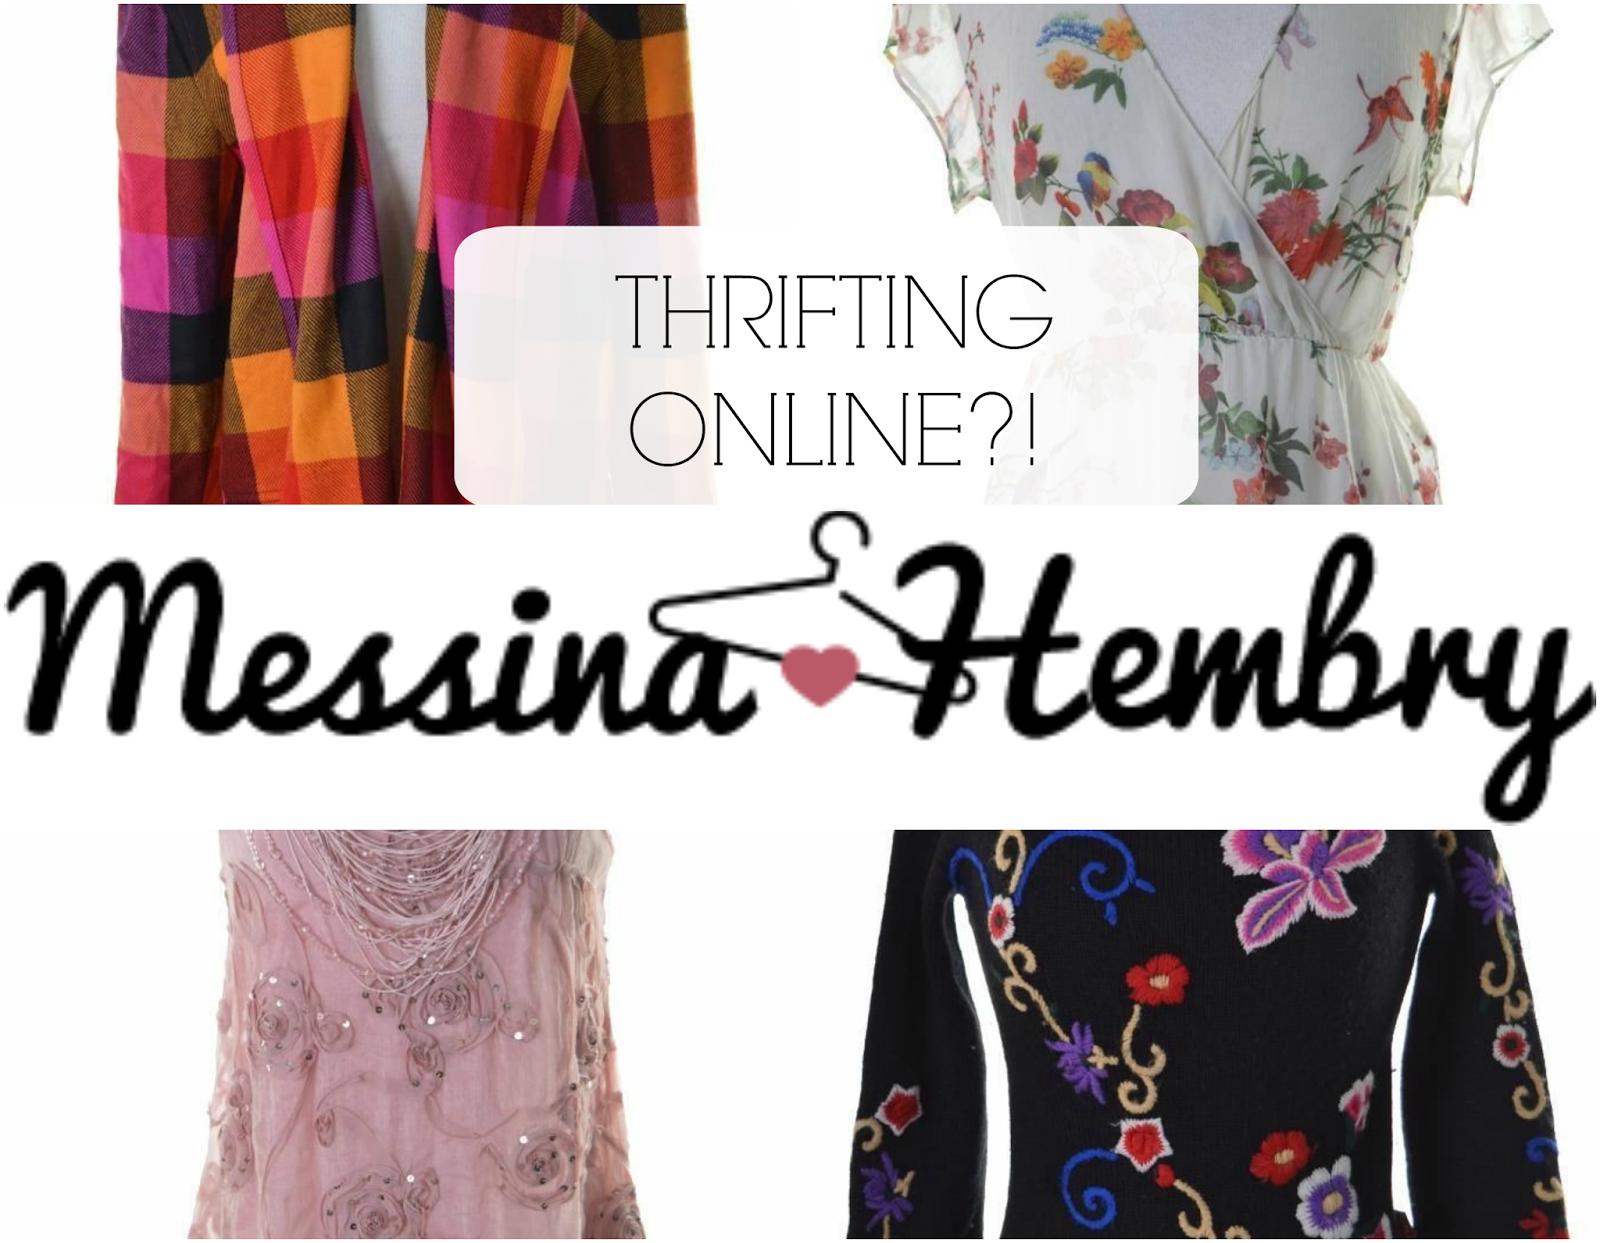 messina hembry designer vintage thrifting online